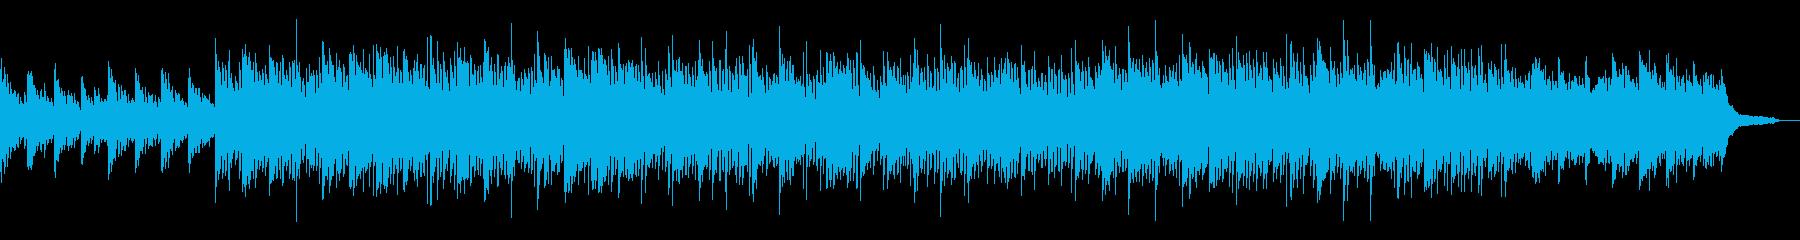 CMや企業VPに  繊細かつ前向きな曲の再生済みの波形